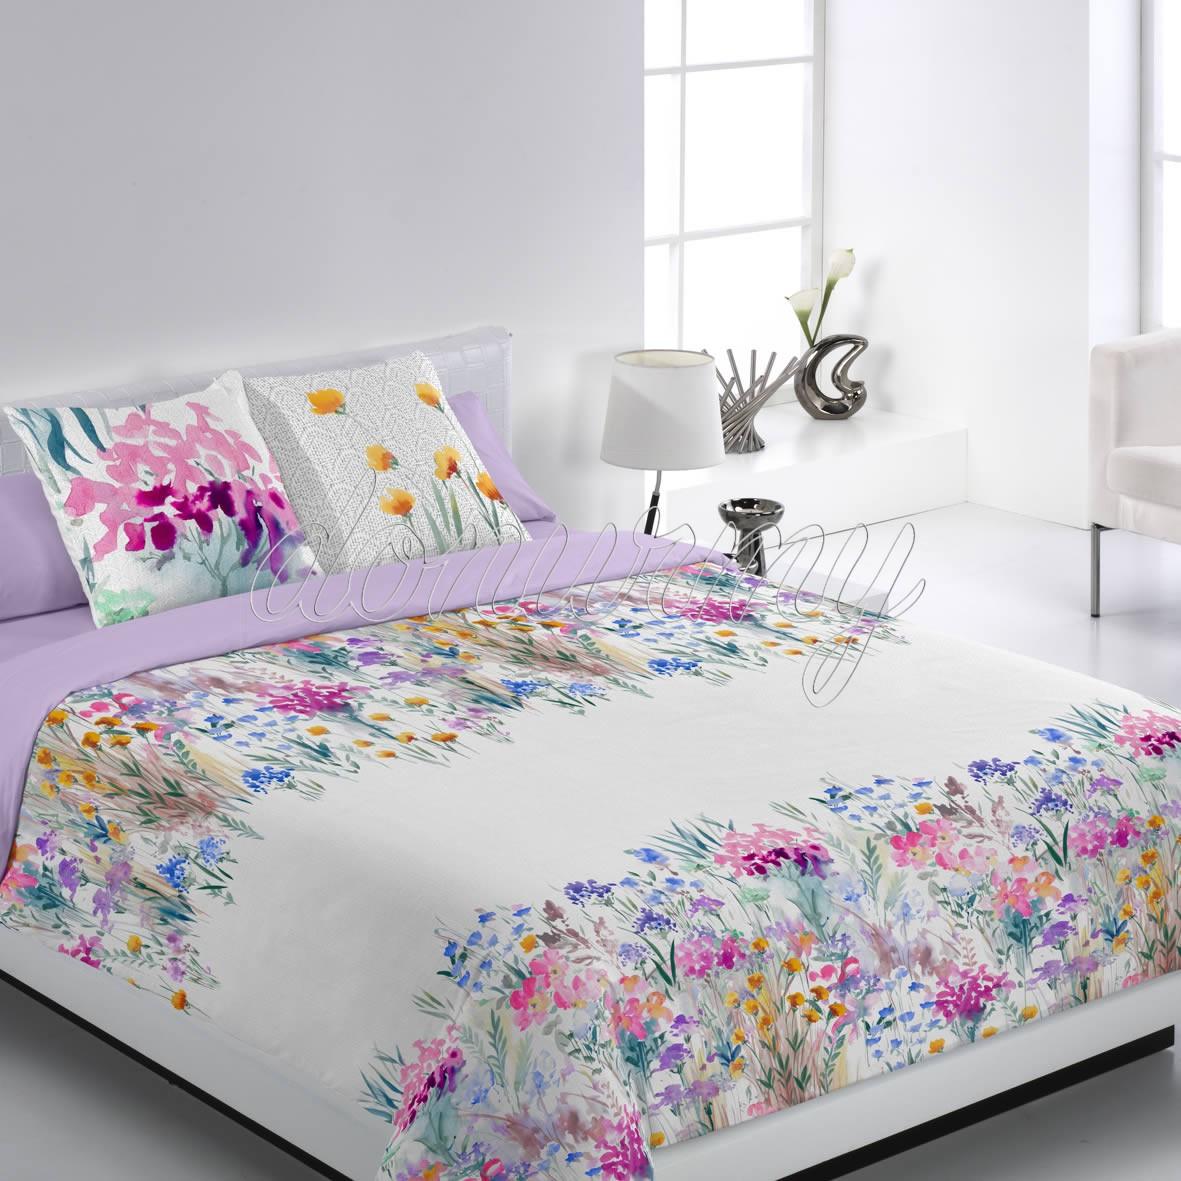 La colecci n encama viste tu cama - Ropa de cama lexington ...